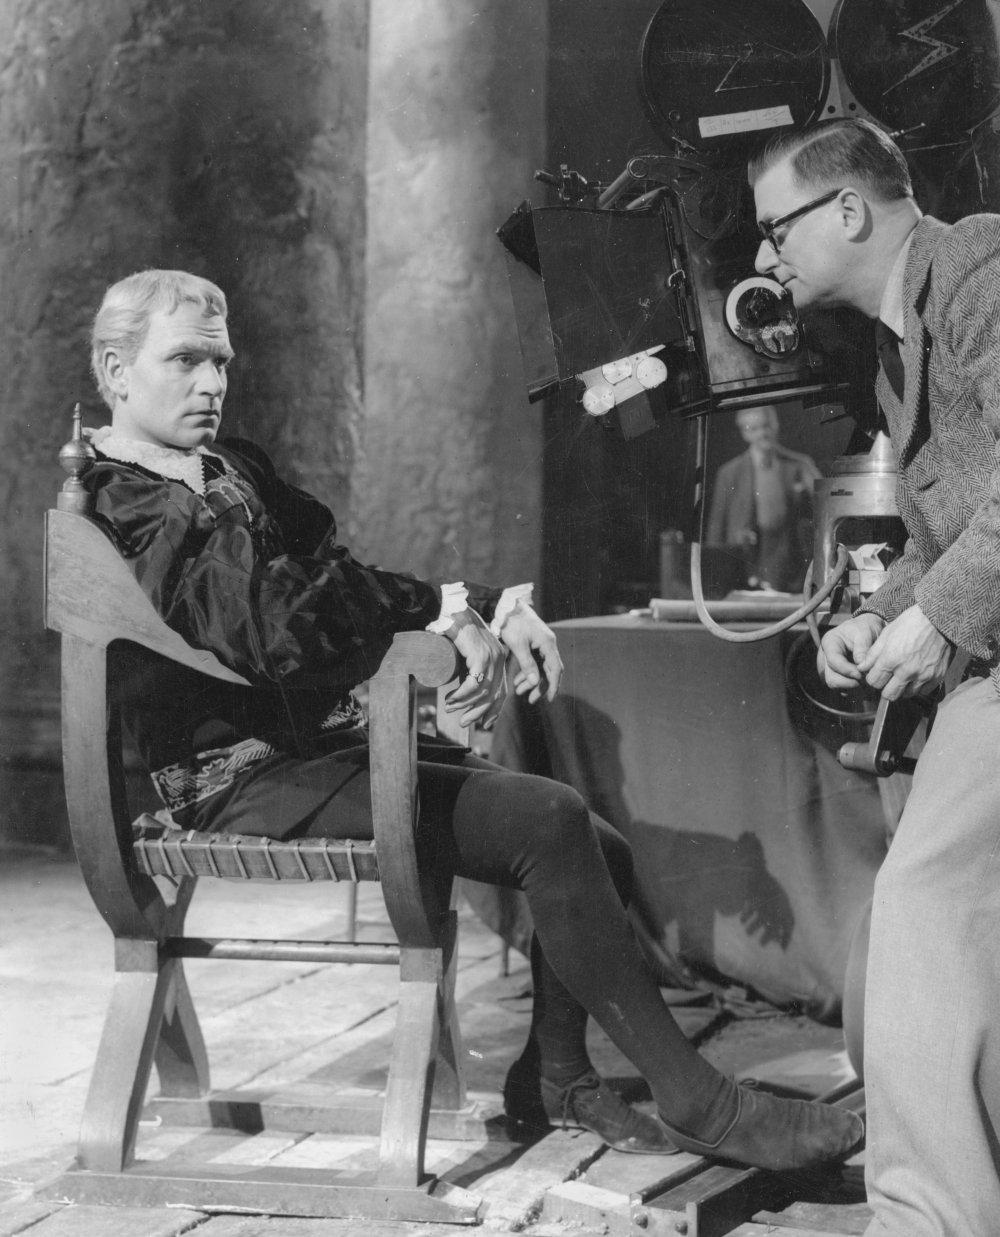 Olivier with cameraman Desmond Dickinson